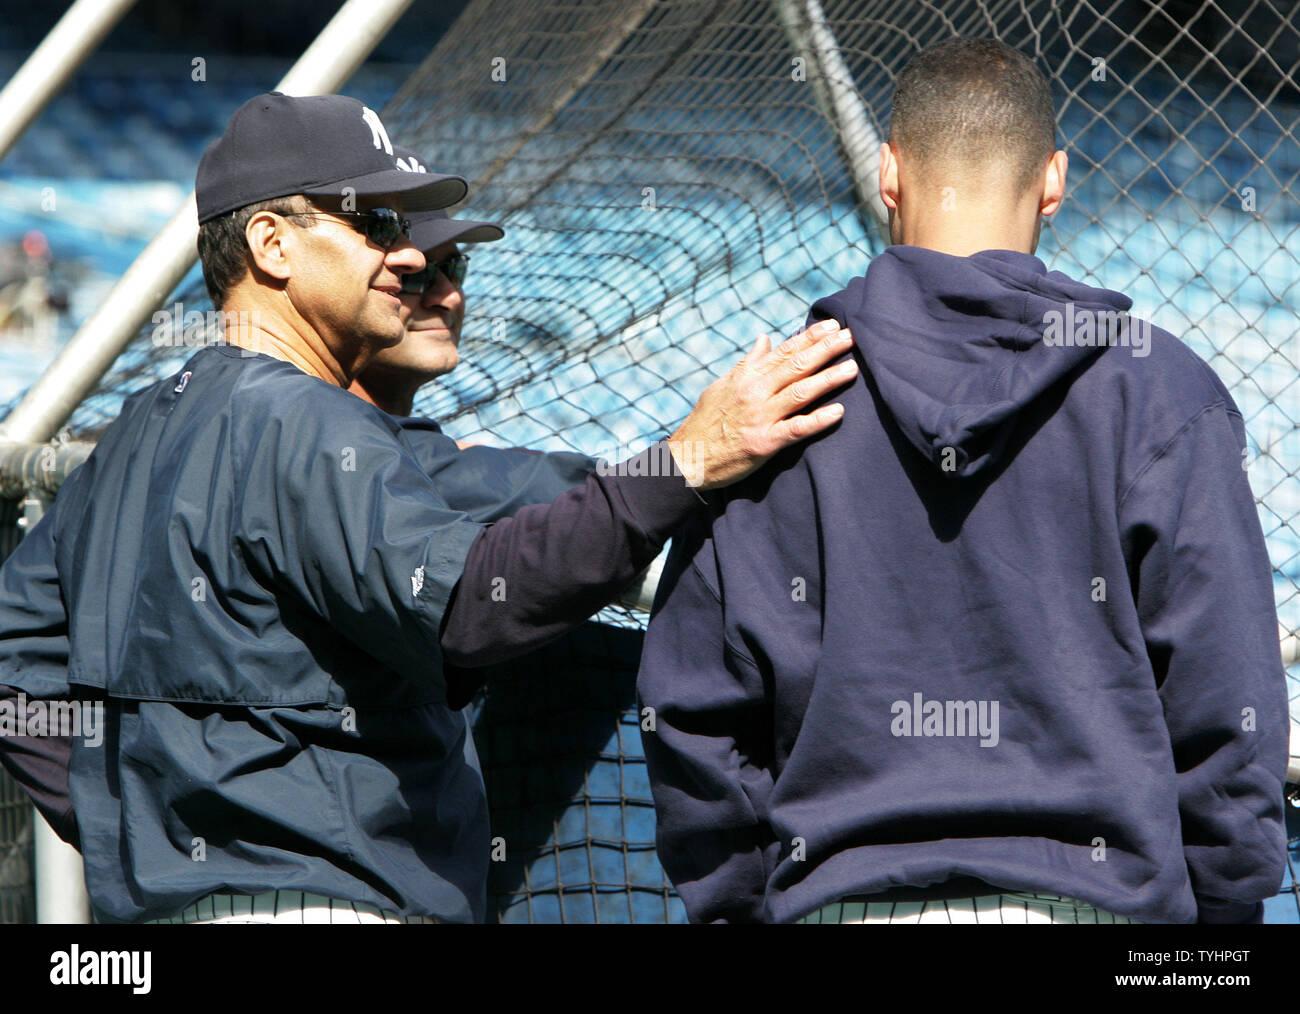 New York Yankees' manager Joe Torre, left, gives shortstop Derek